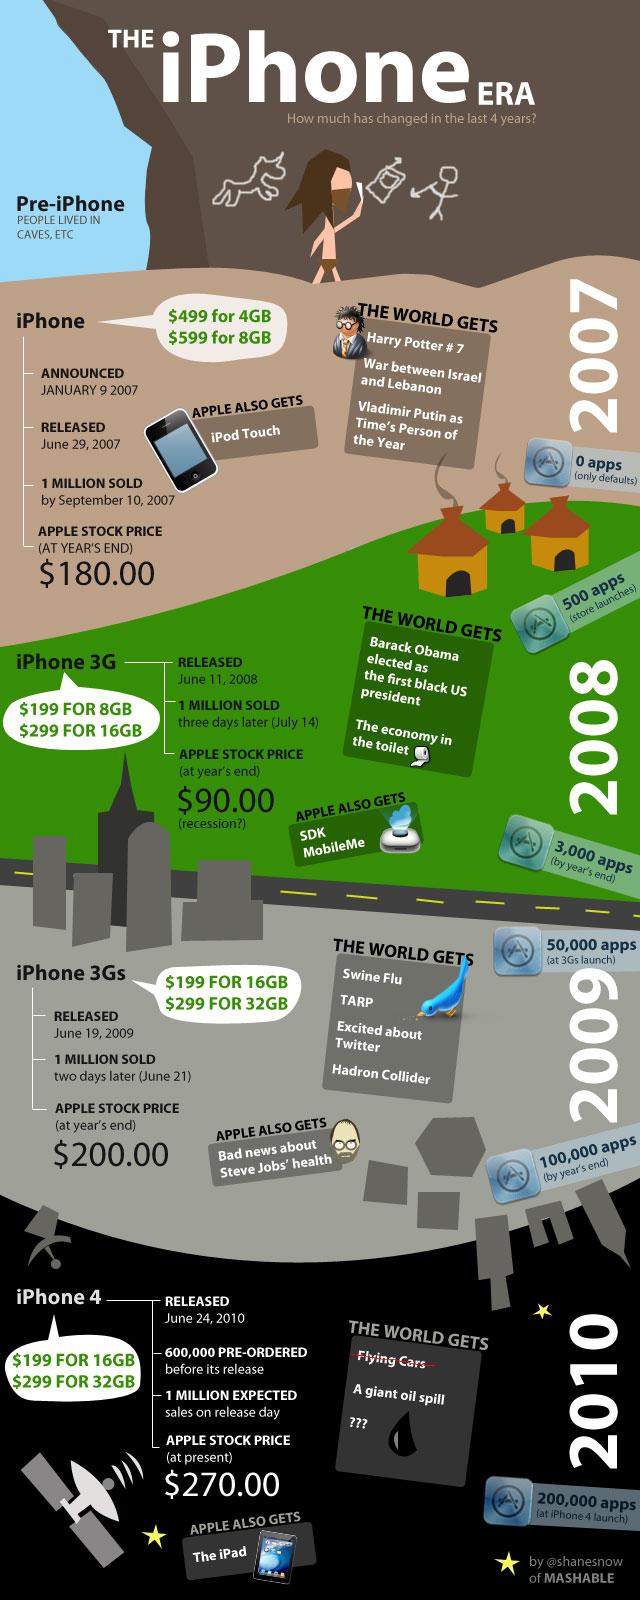 The iPhone Era